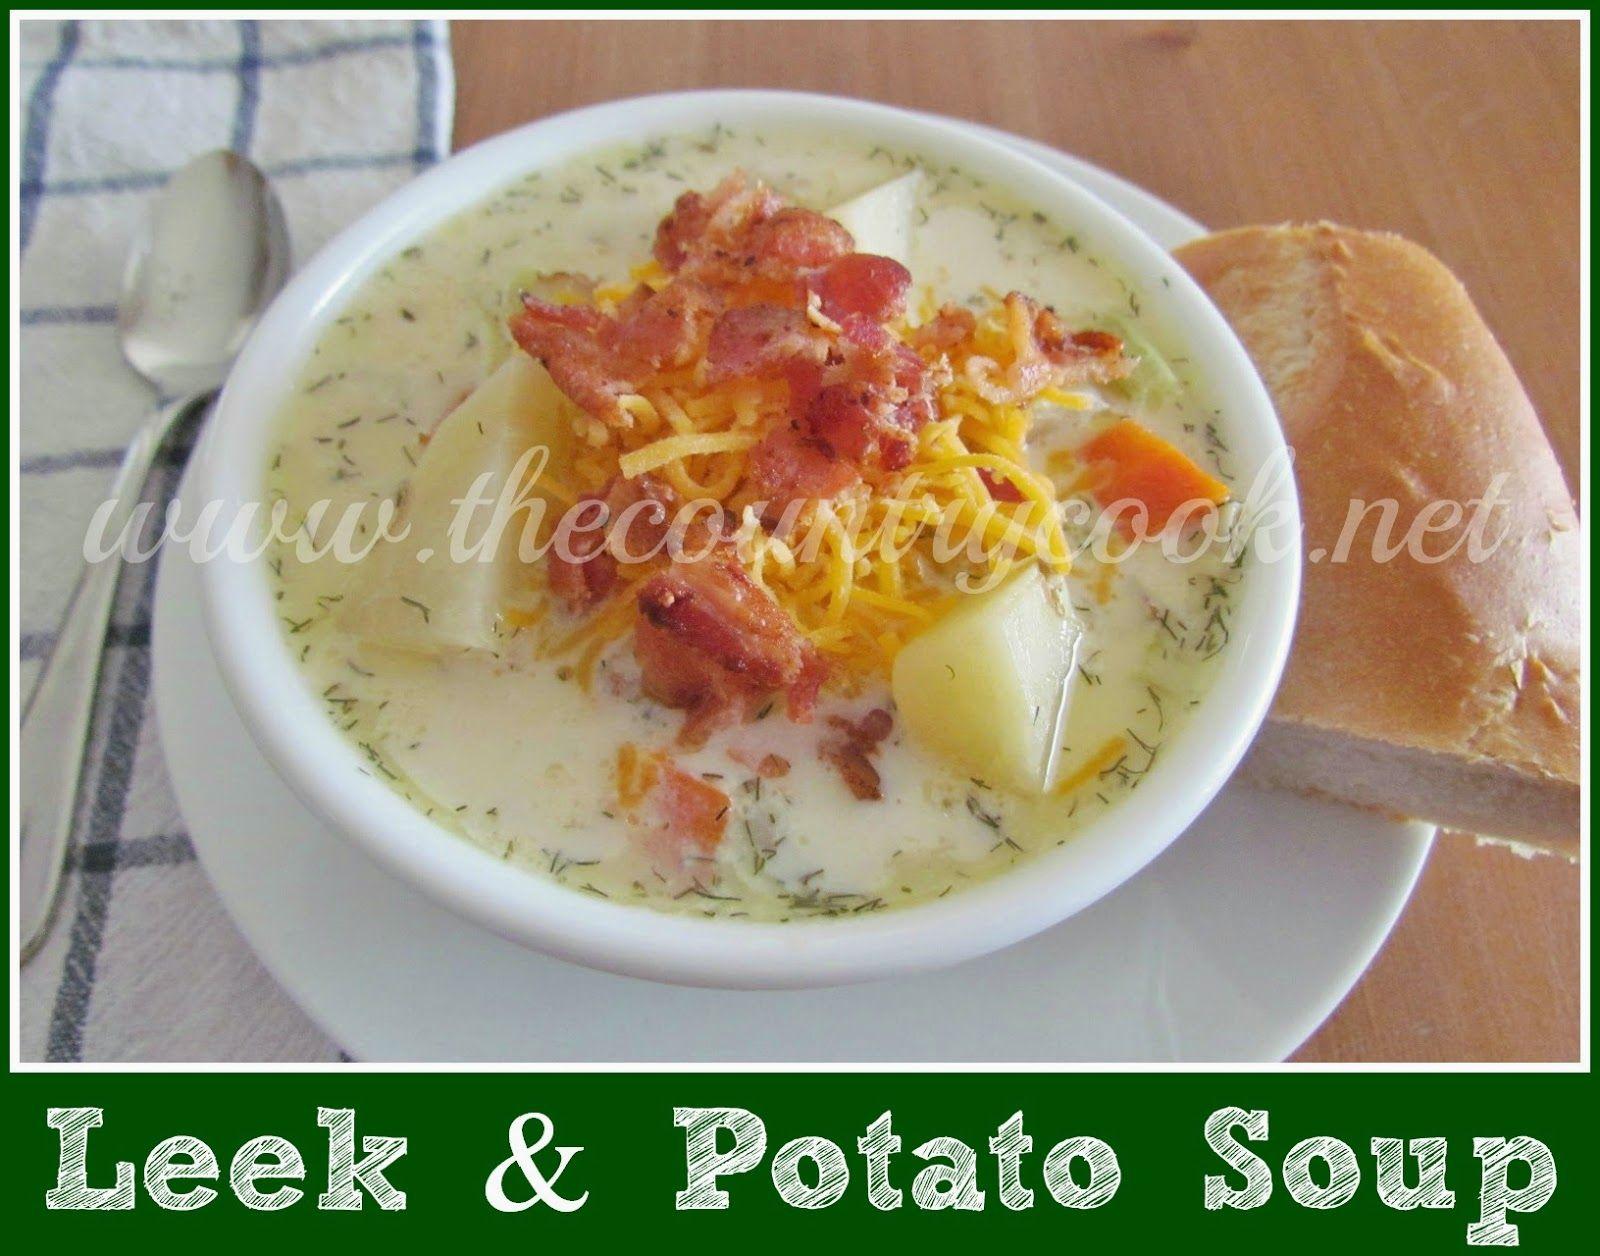 Crock pot leek and potato soup Recipe (With images